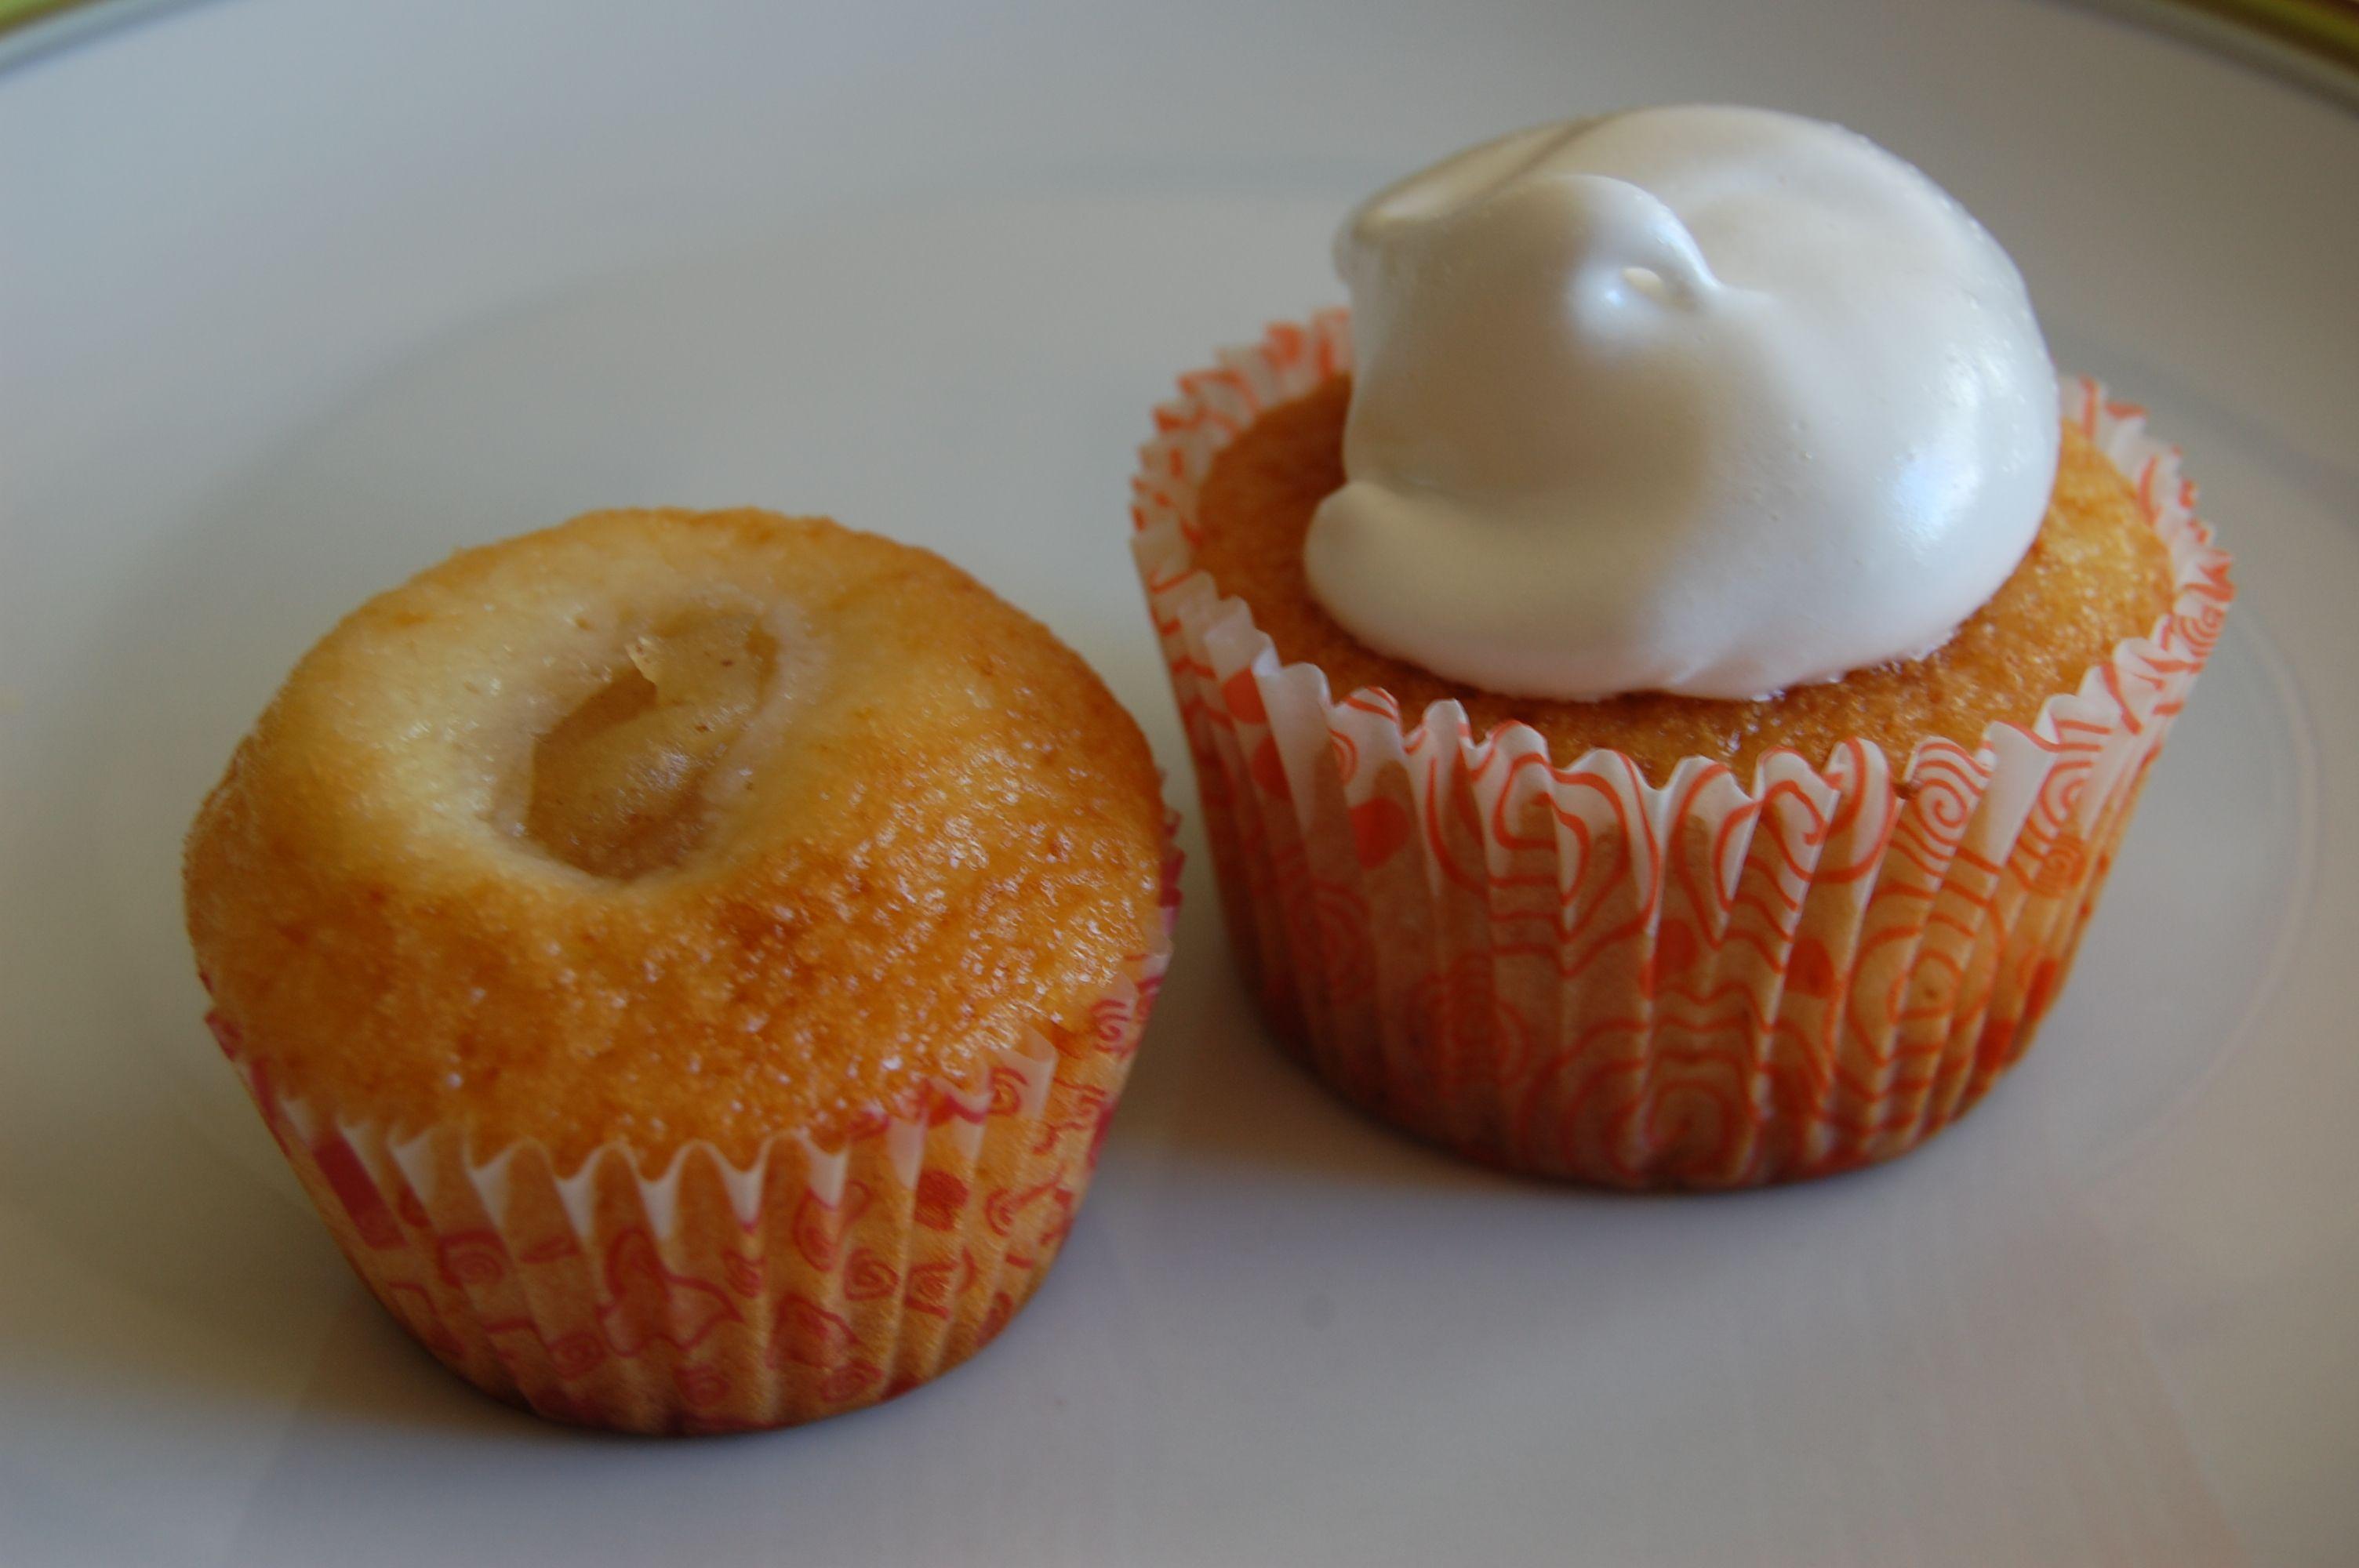 Cupcakes de sidra rellenos de puré de manzana